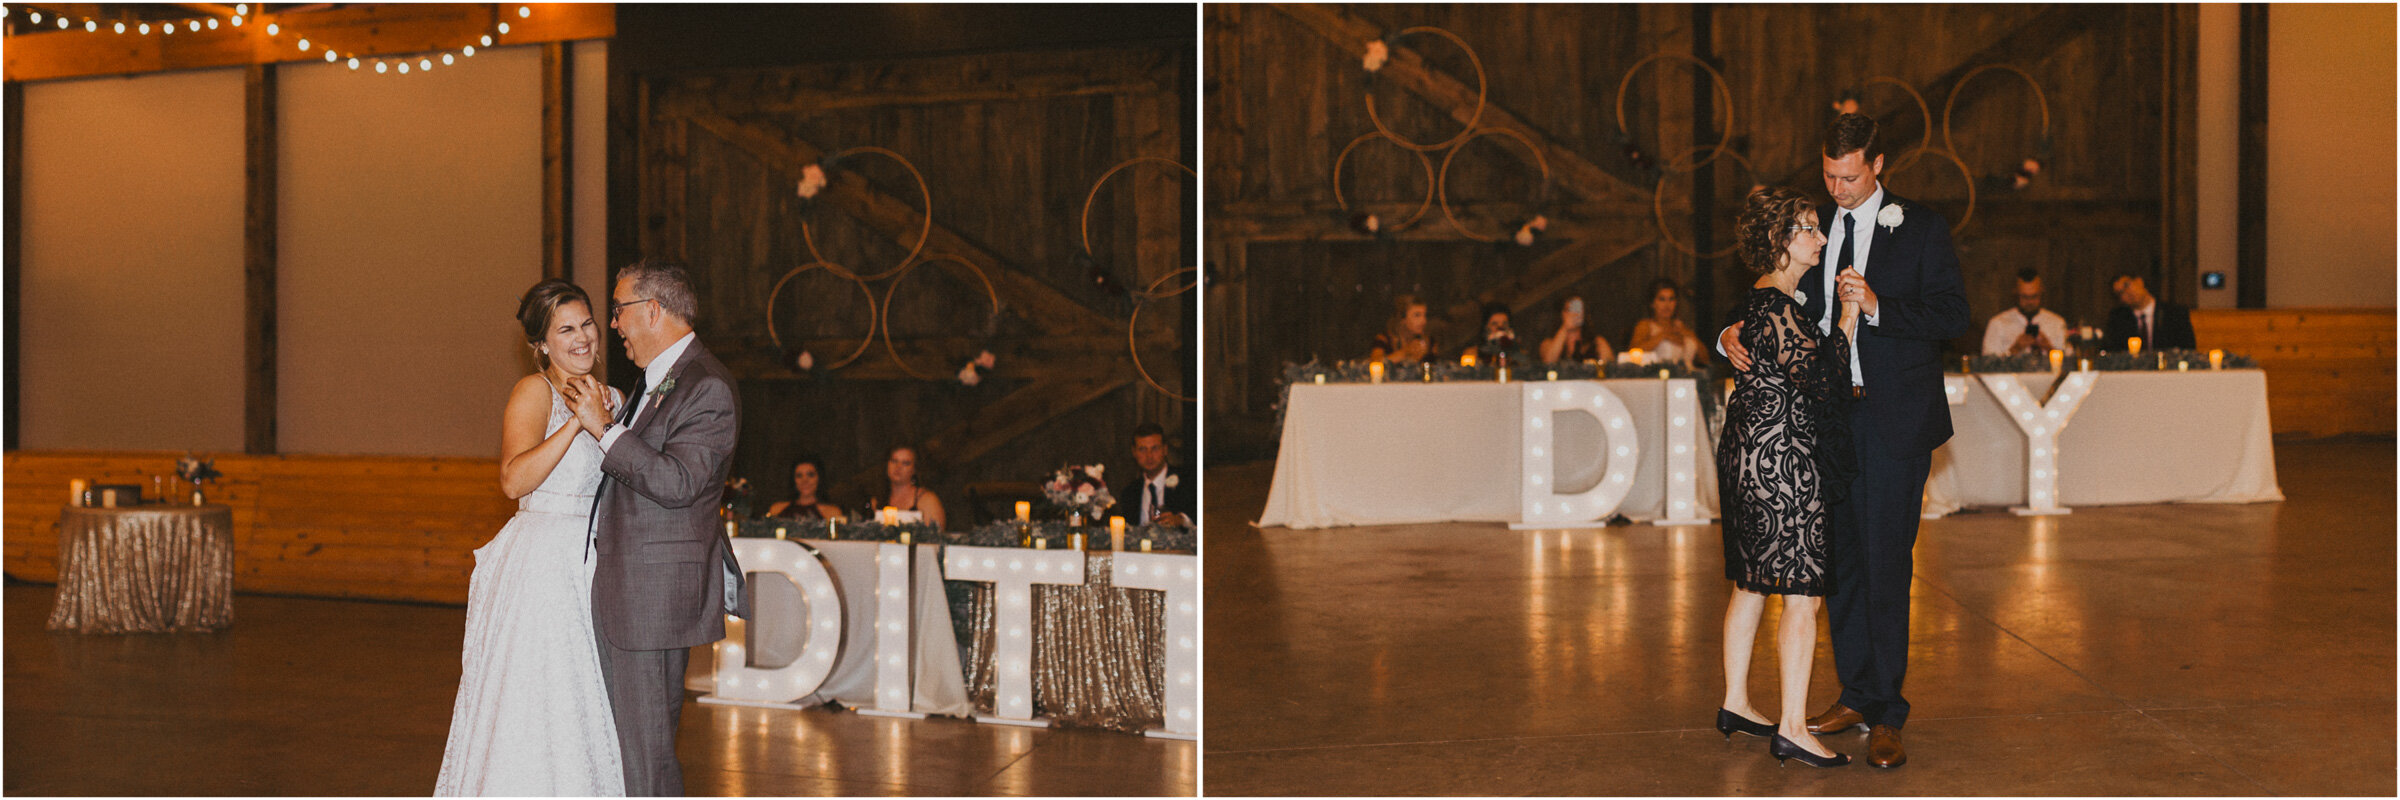 alyssa barletter photography summer wedding photographer powell gardens-41.jpg